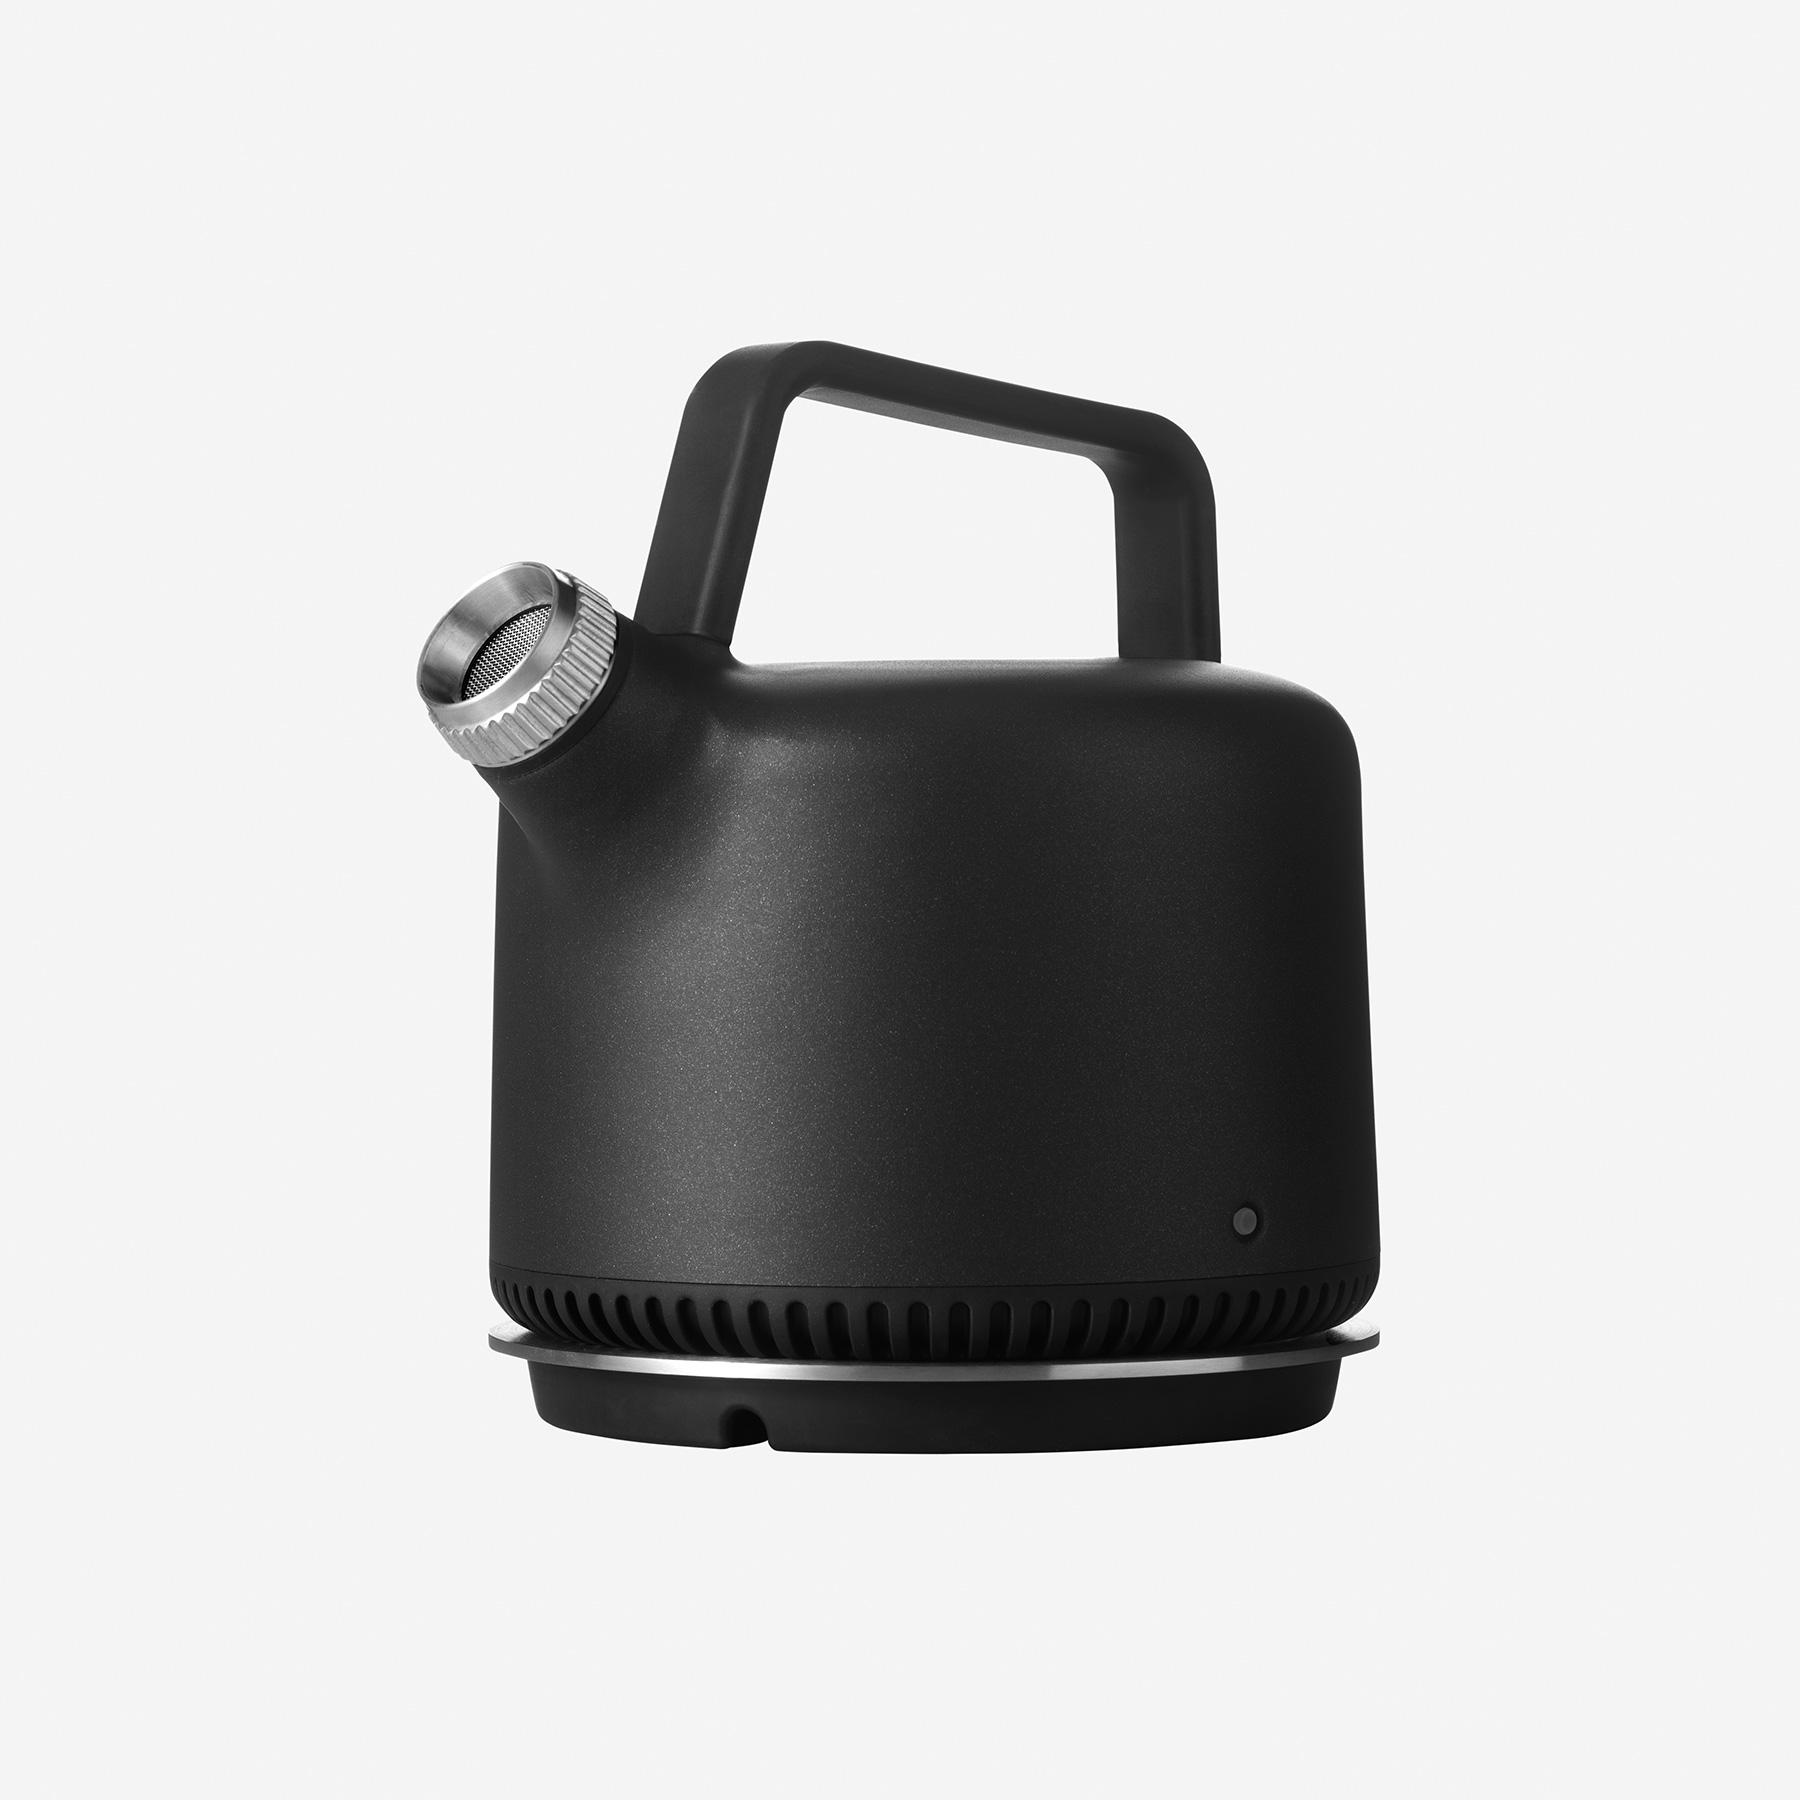 vipp501-electric-kettle-1.jpg